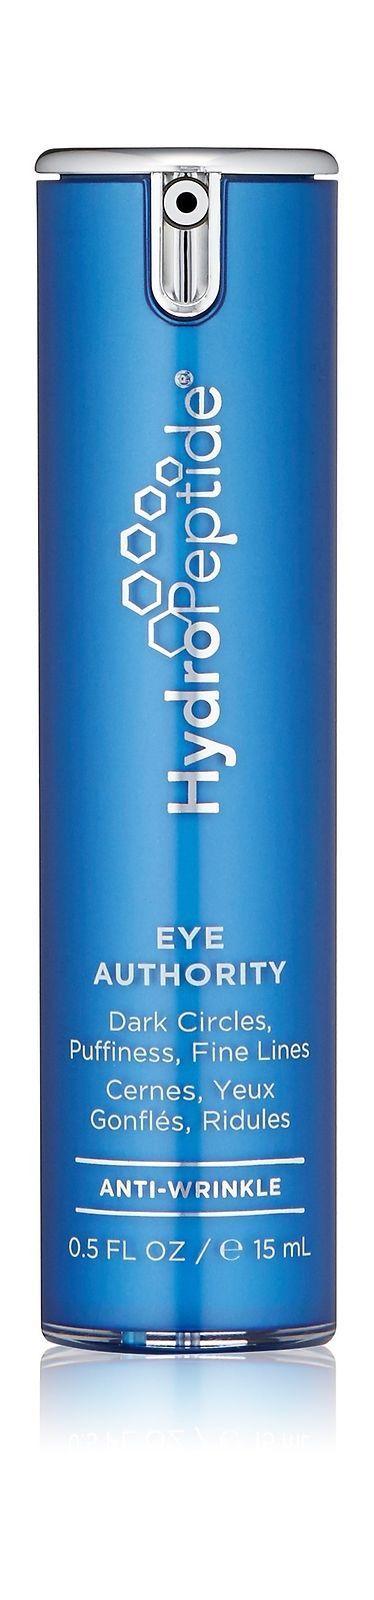 Hydropeptide Eye Authority Dark Circles Puffiness & Fine Line Eliminator .5 oz